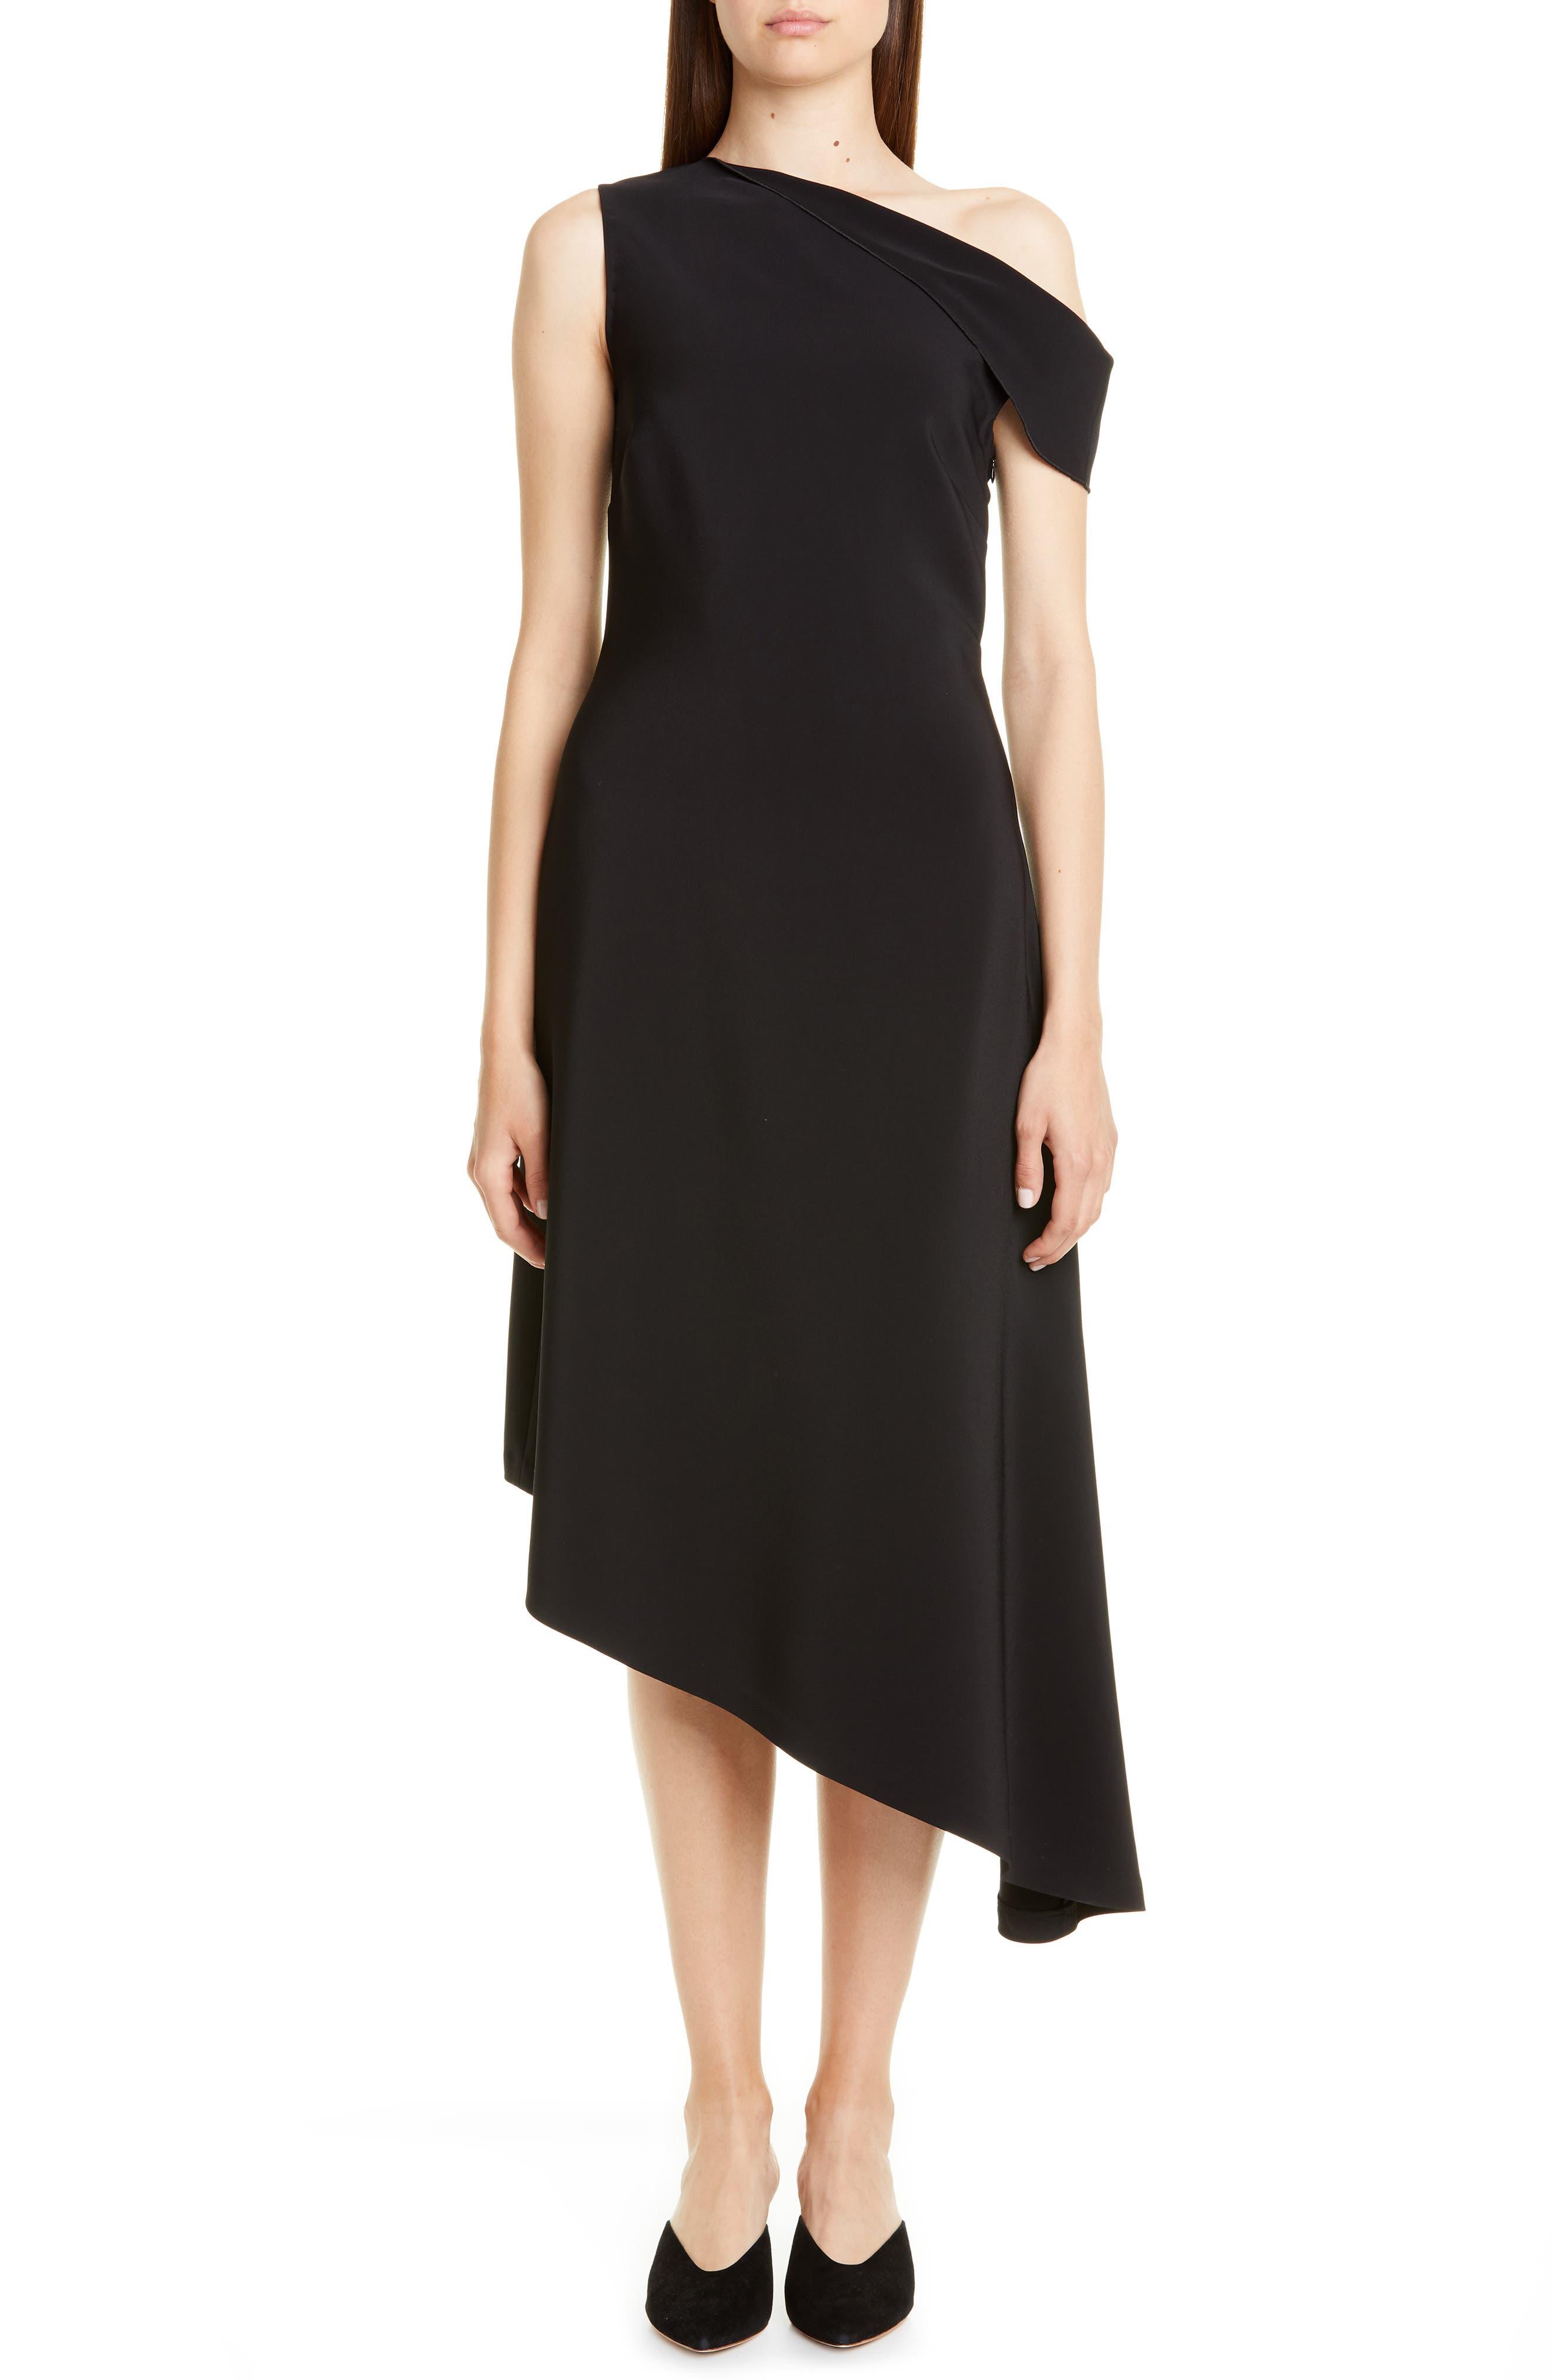 Rosetta Getty Dresses One-Shoulder Asymmetrical Midi Dress